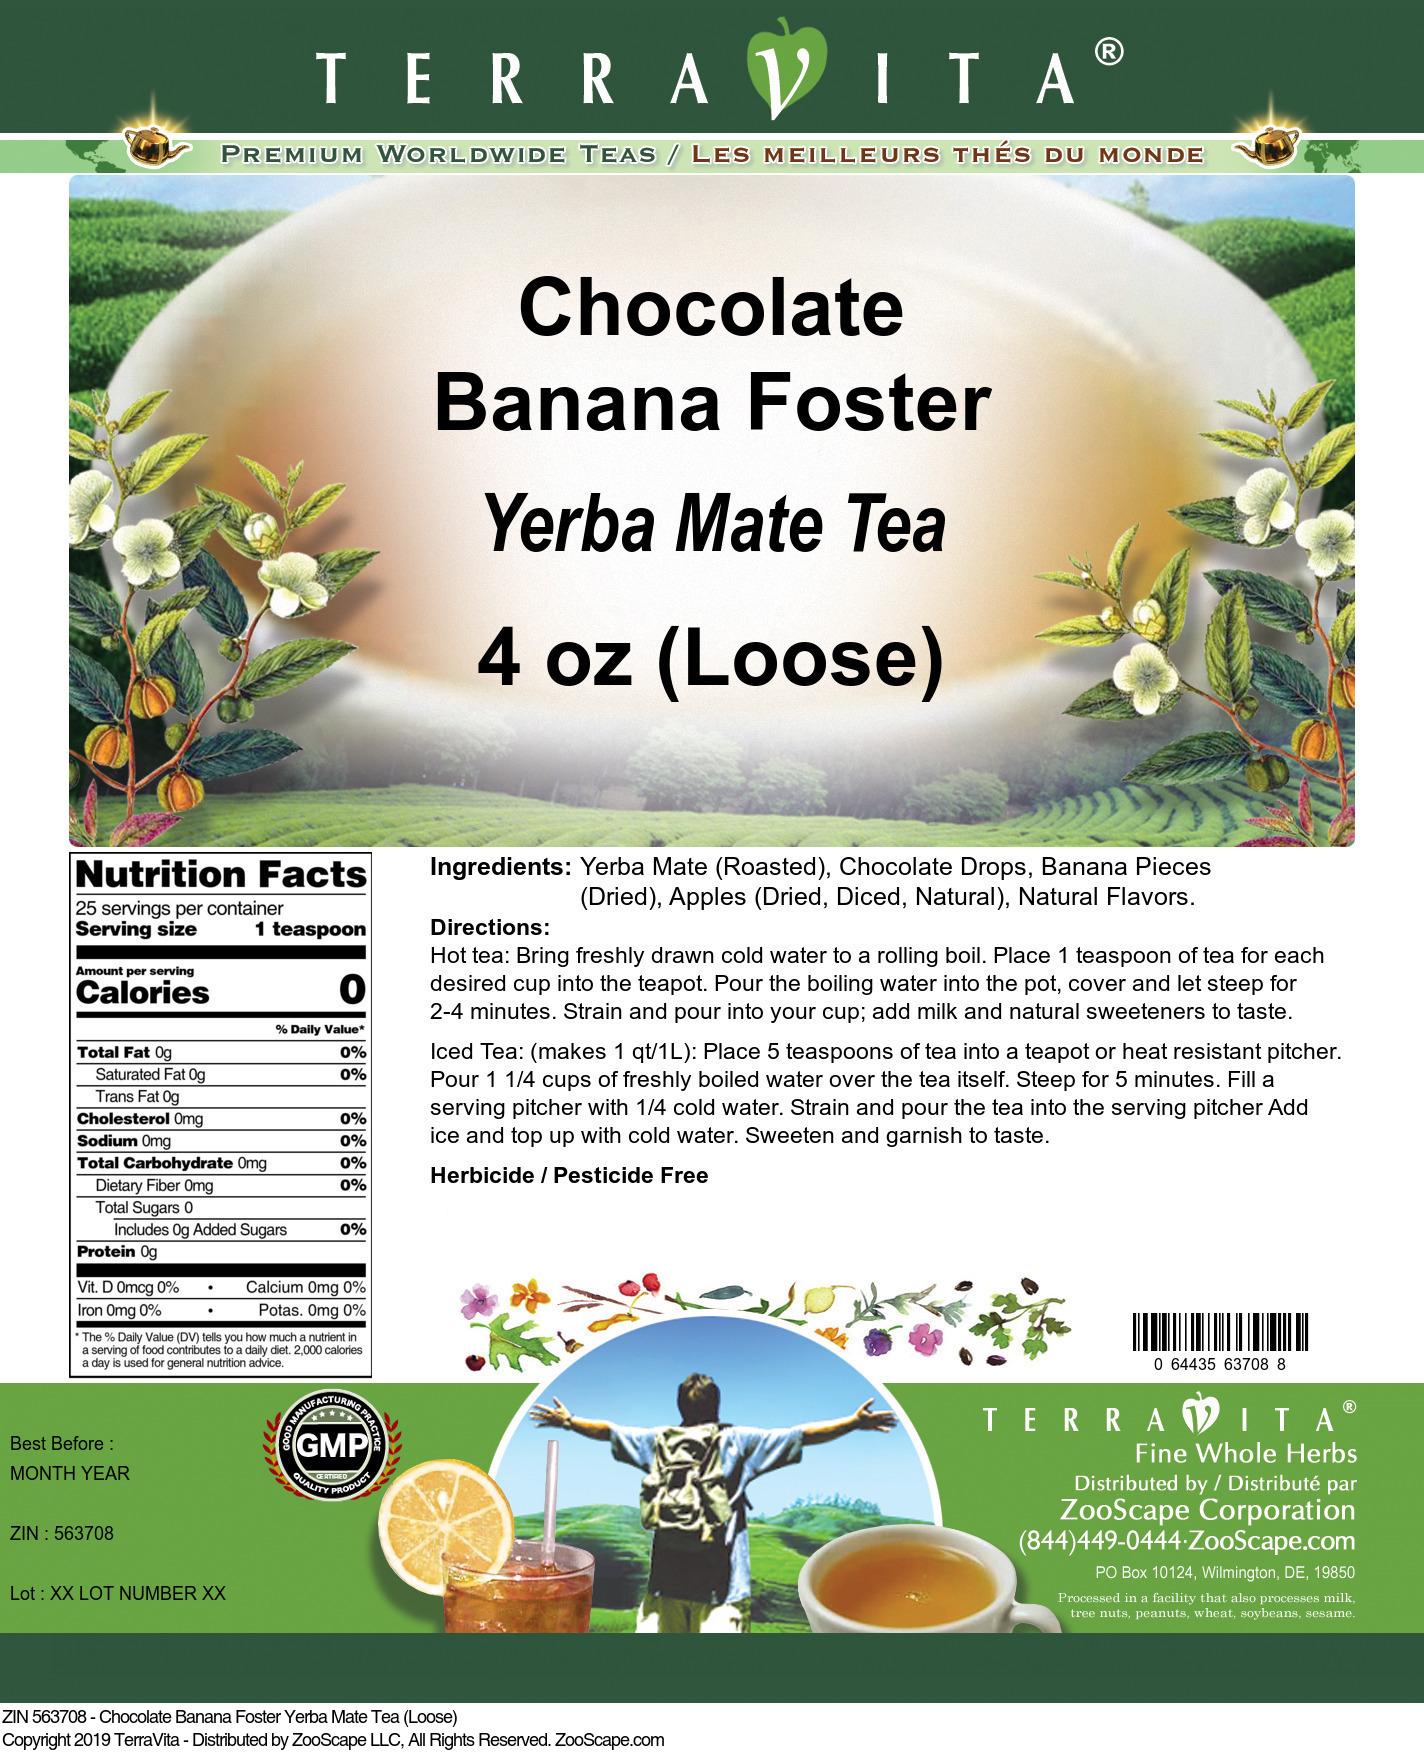 Chocolate Banana Foster Yerba Mate Tea (Loose)